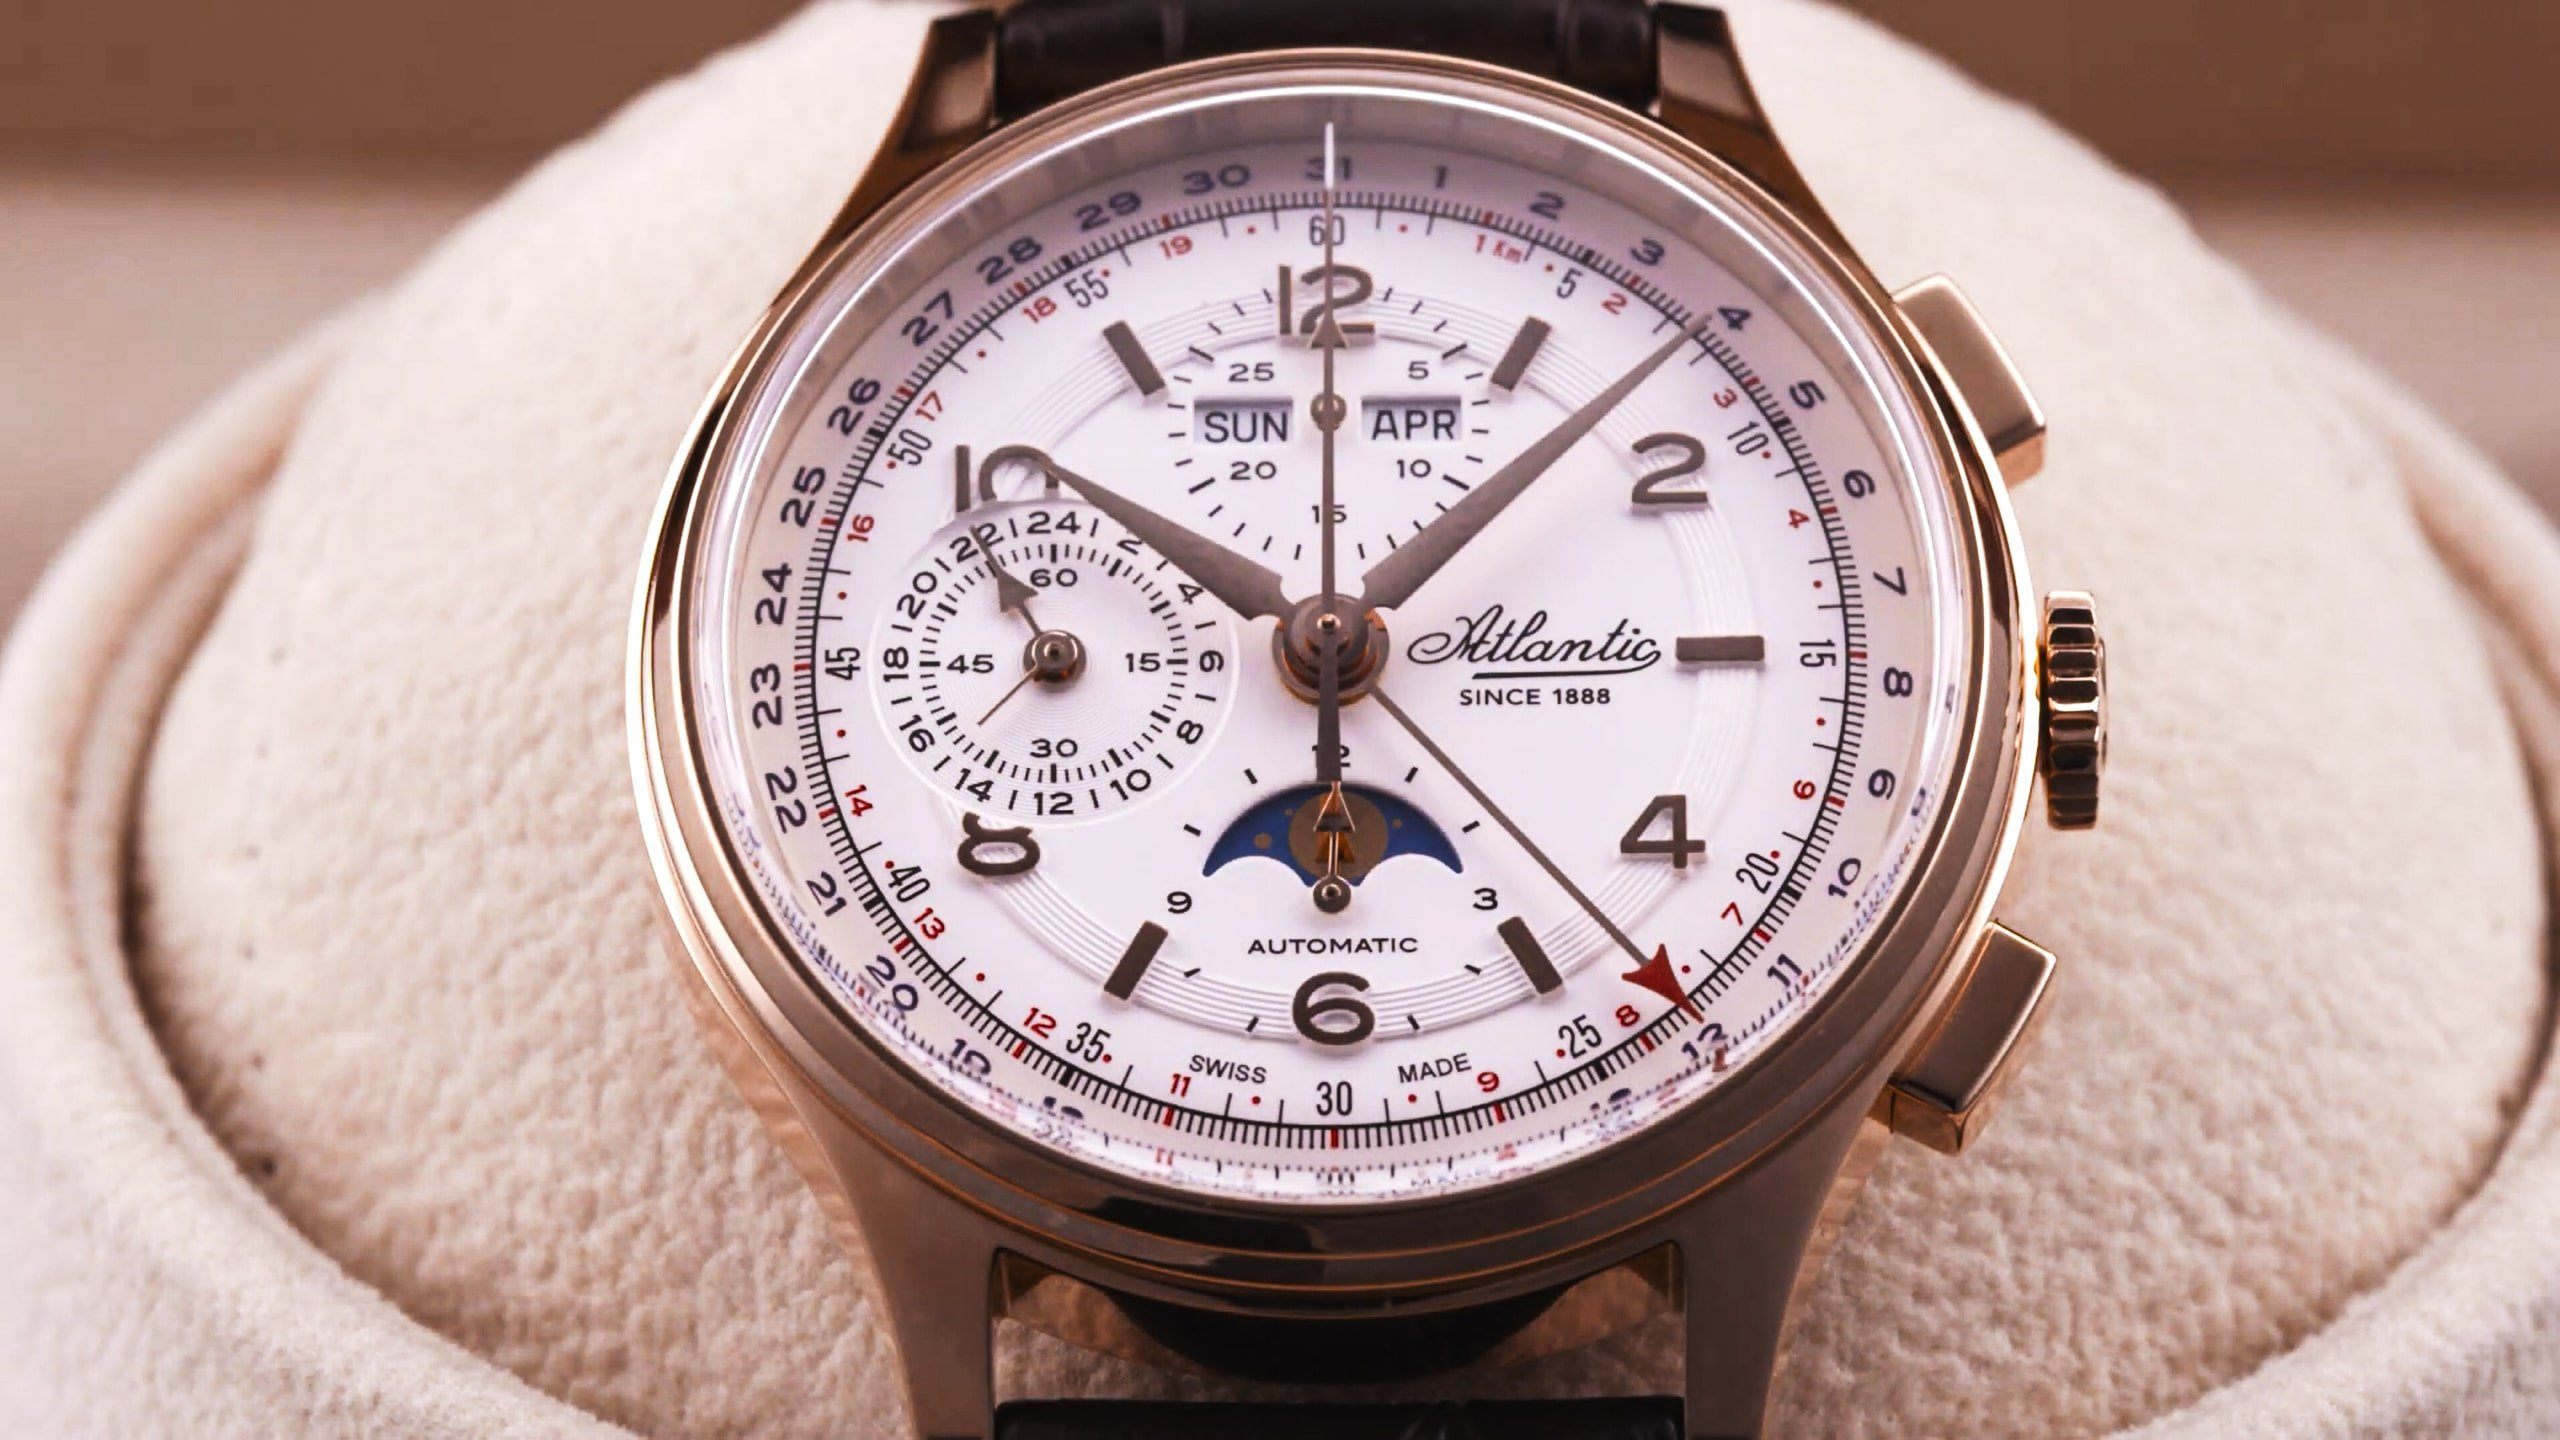 niesamowite detale w zegarku Atlantic Moonphase Chronograph Universal